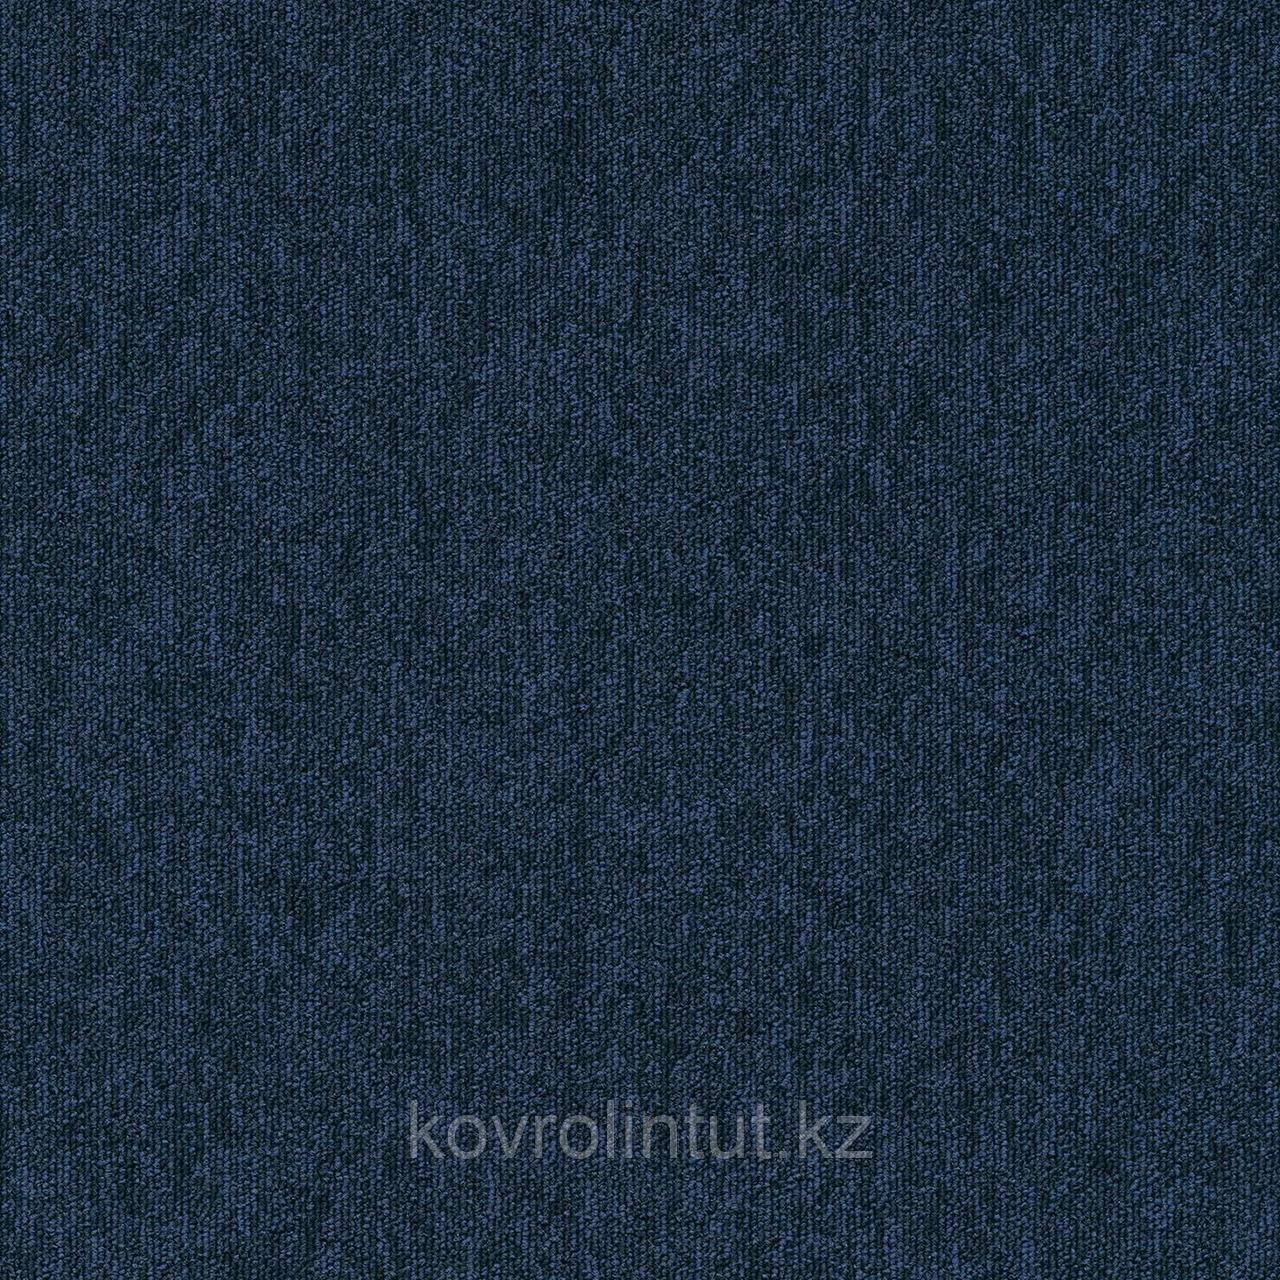 Плитка ковровая Modulyss First 504, 100% PA